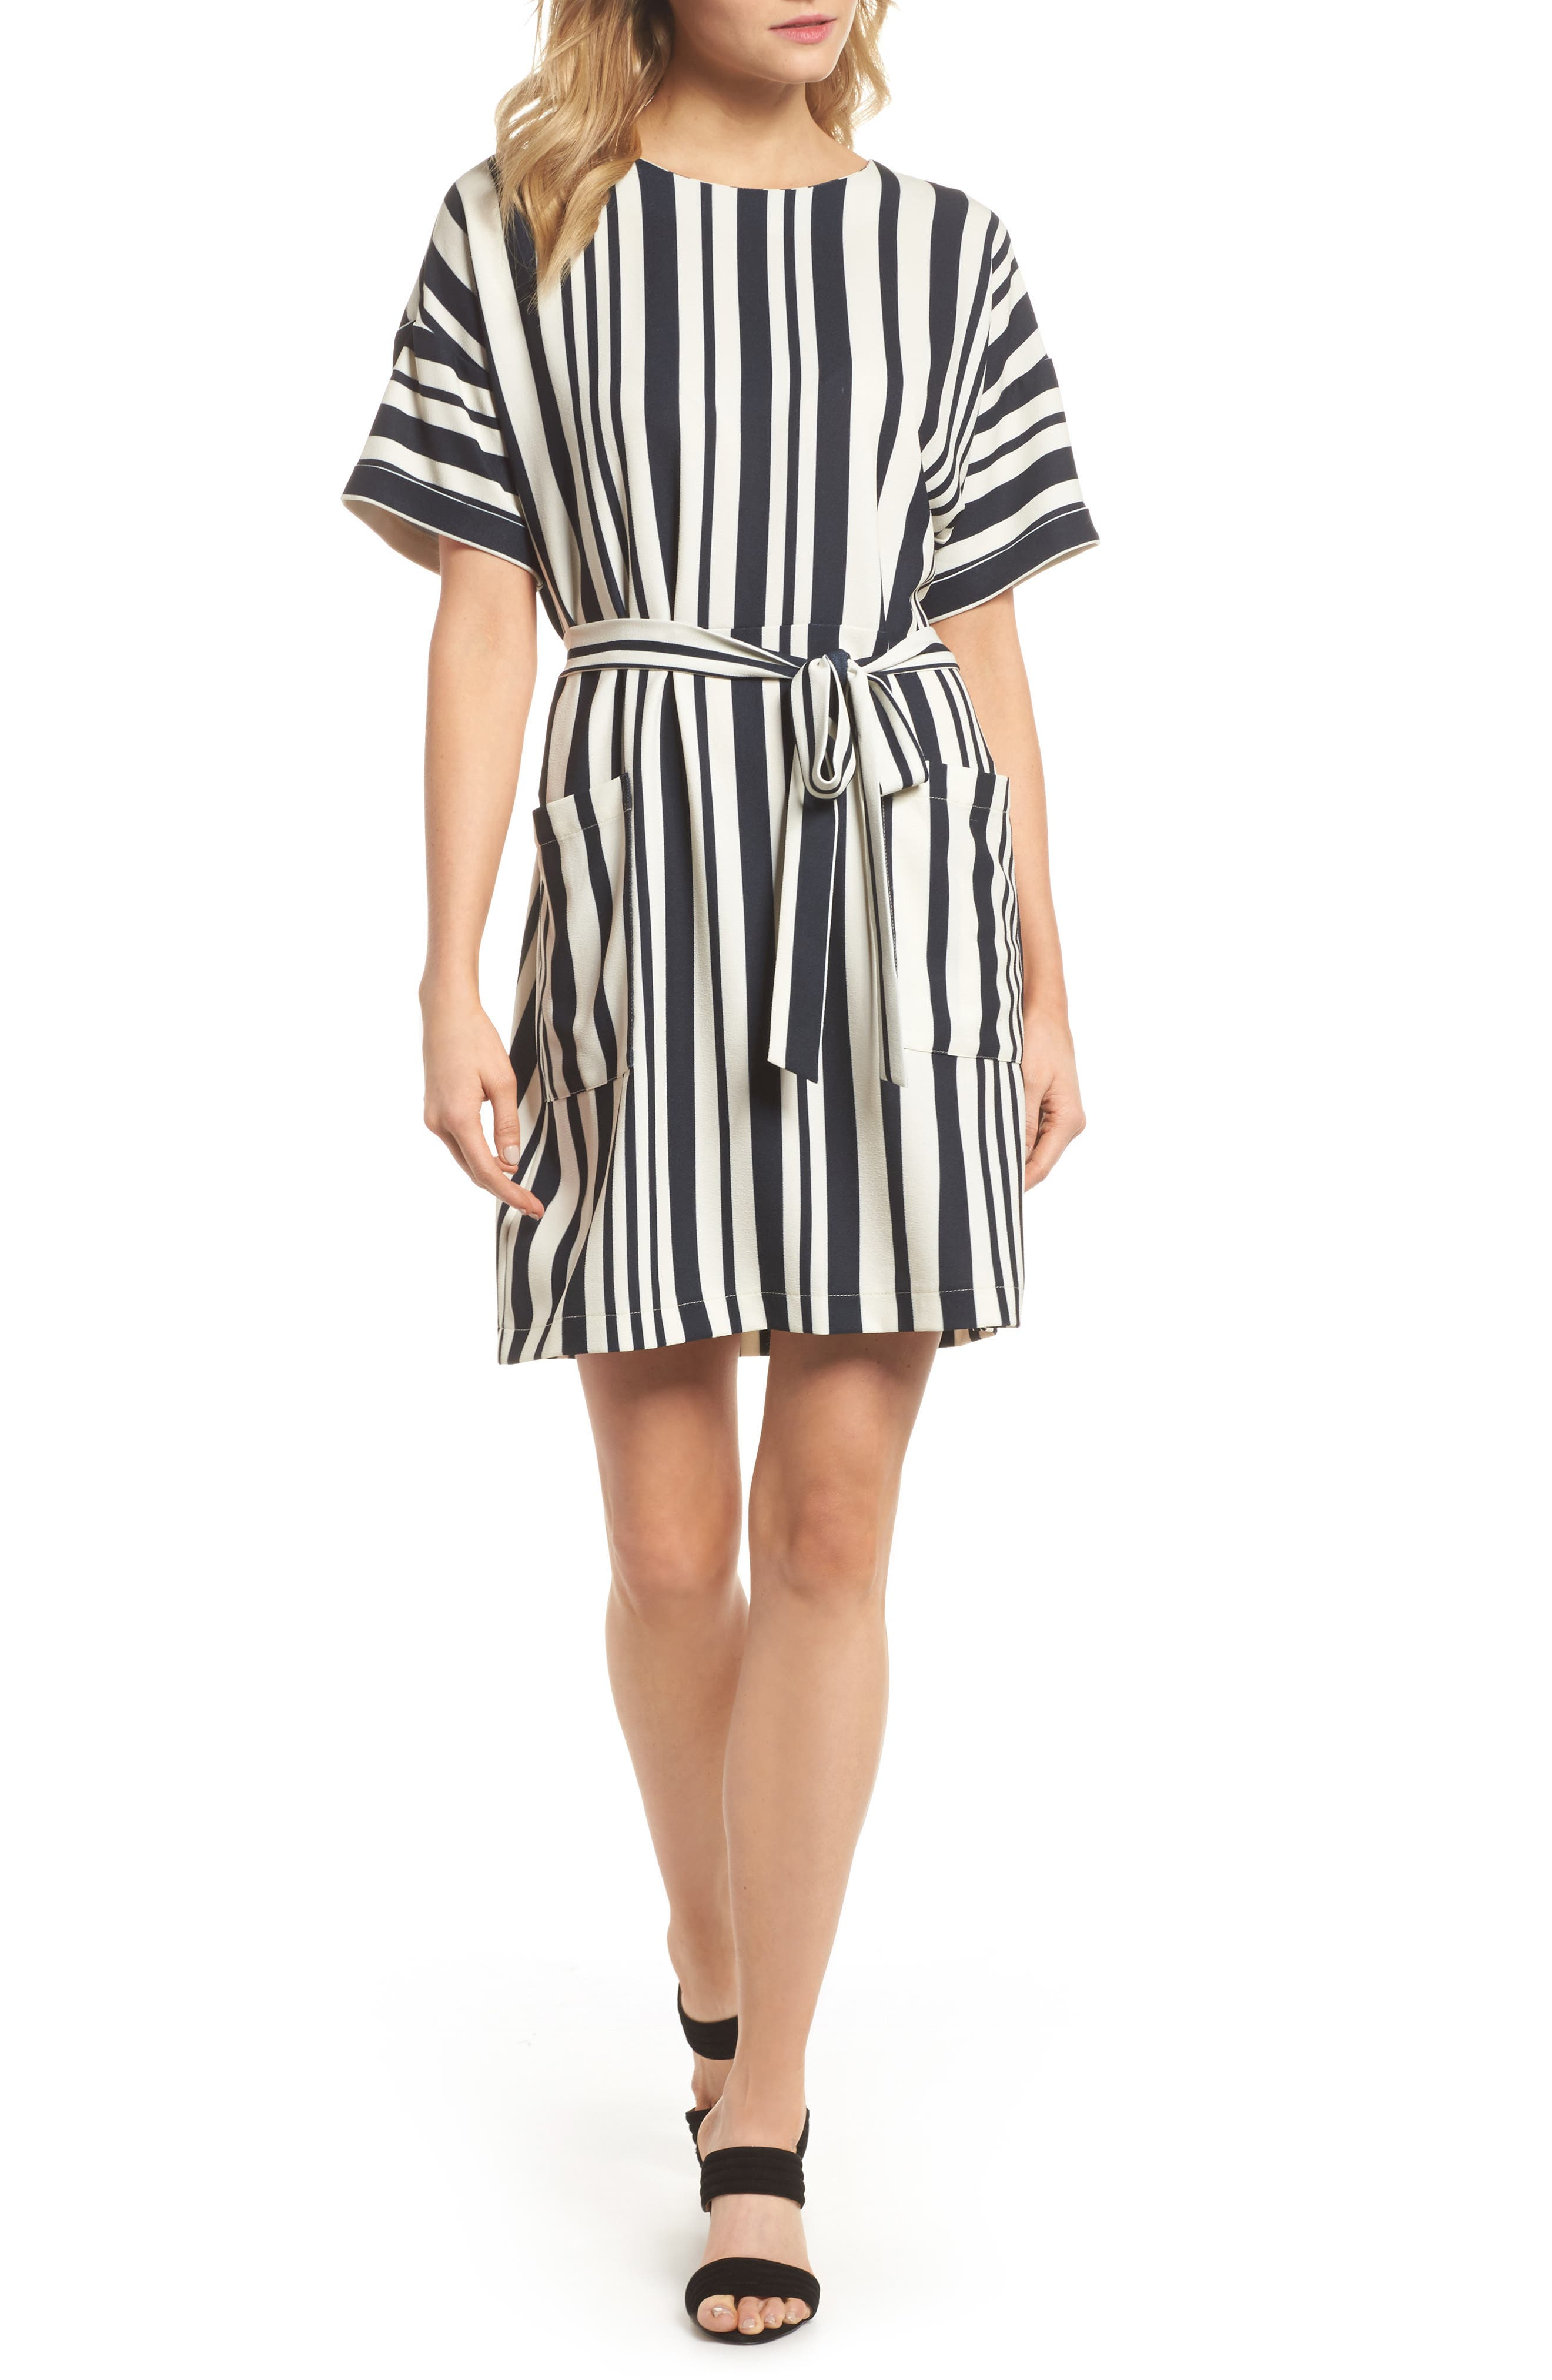 Alternate Image 1 Selected - Felicity & Coco Sterling Stripe Dress